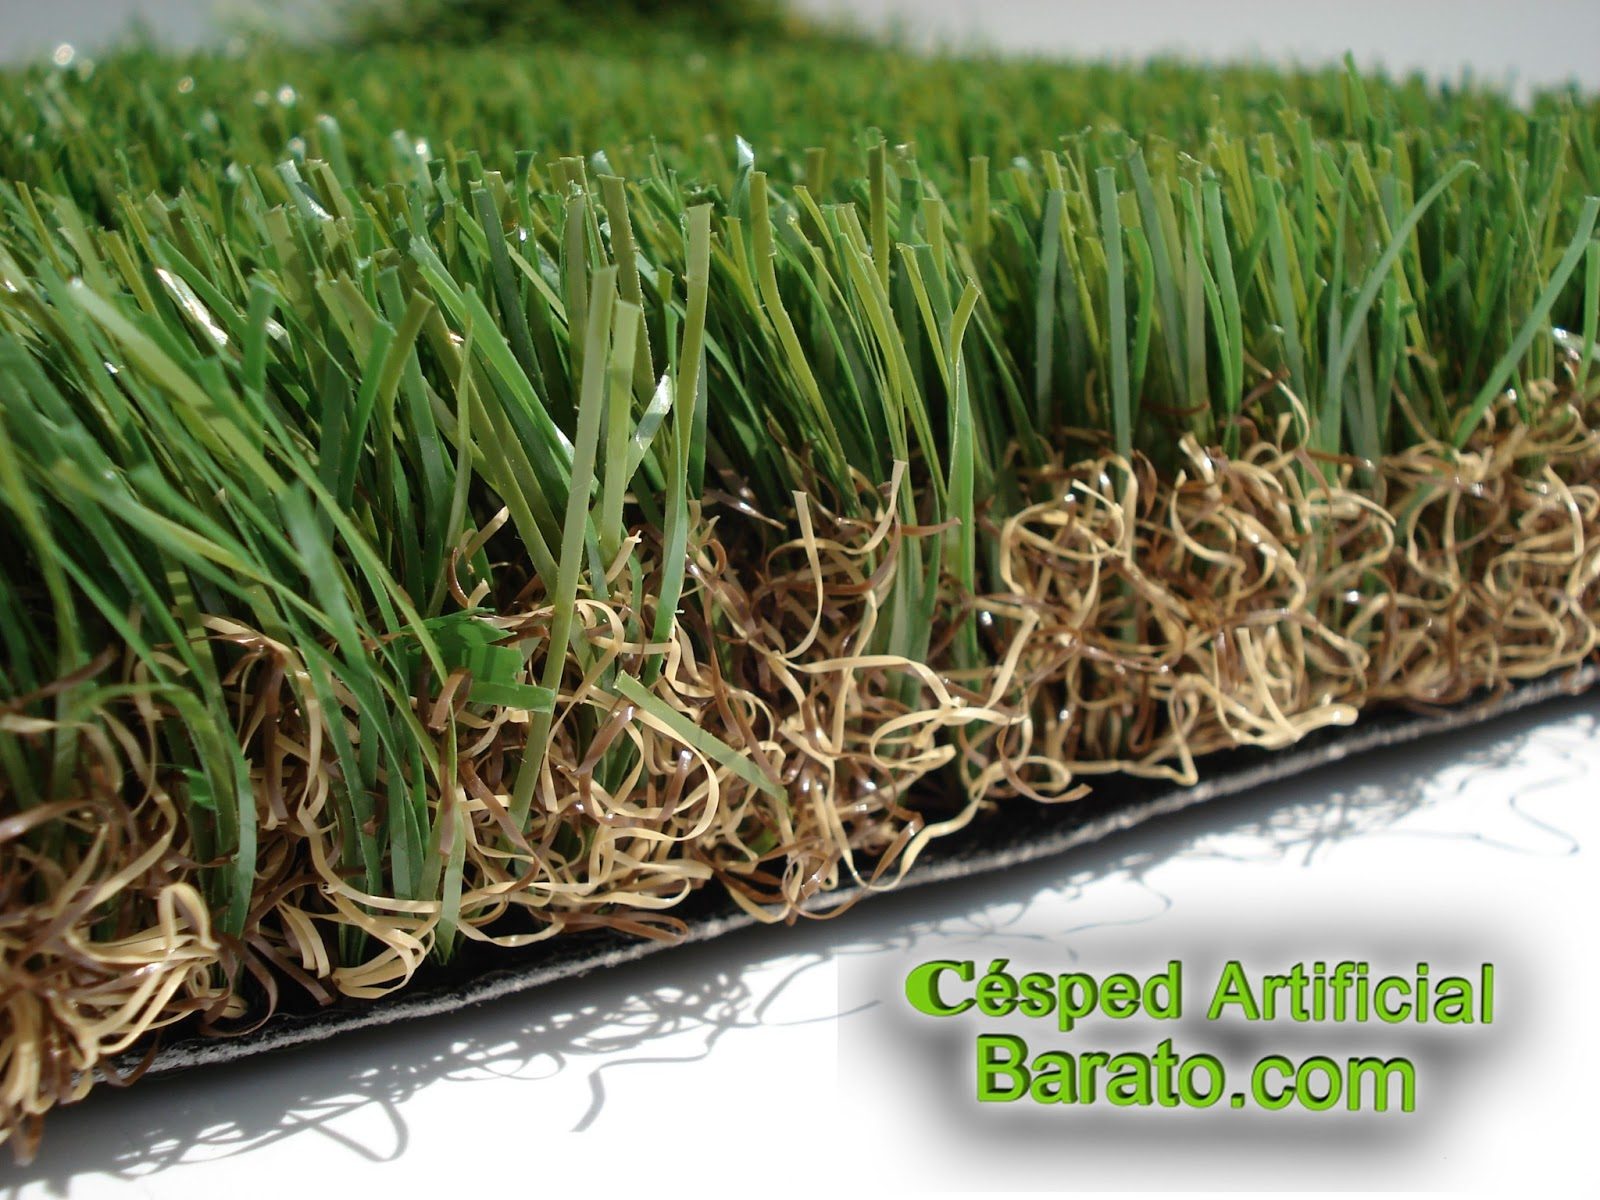 Ofertas c sped artificial barato julio 2013 - Fabrica cesped artificial ...